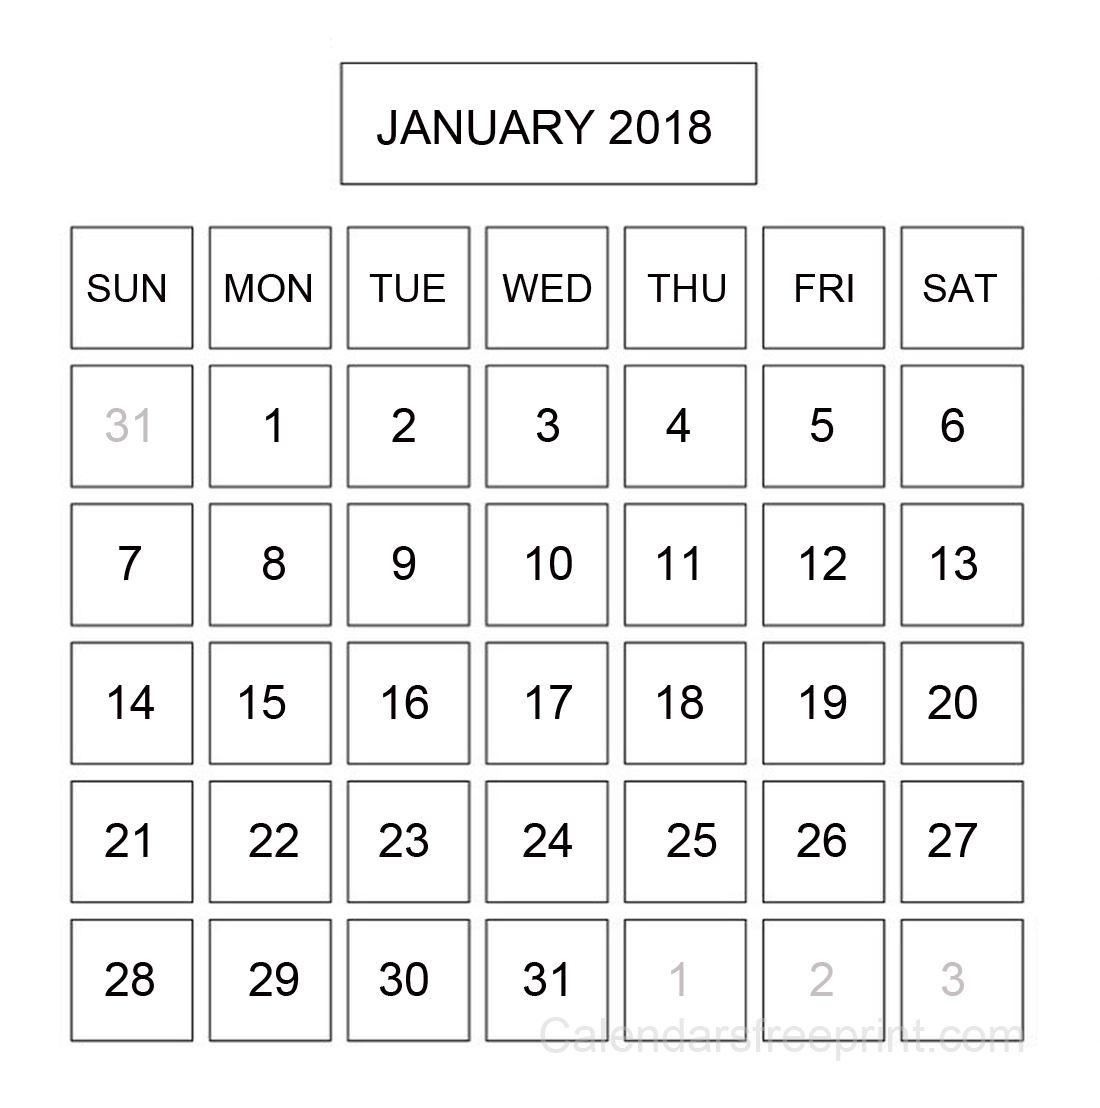 January 2018 Desktop Calendar mathmarkstrainonescom 1100x1108